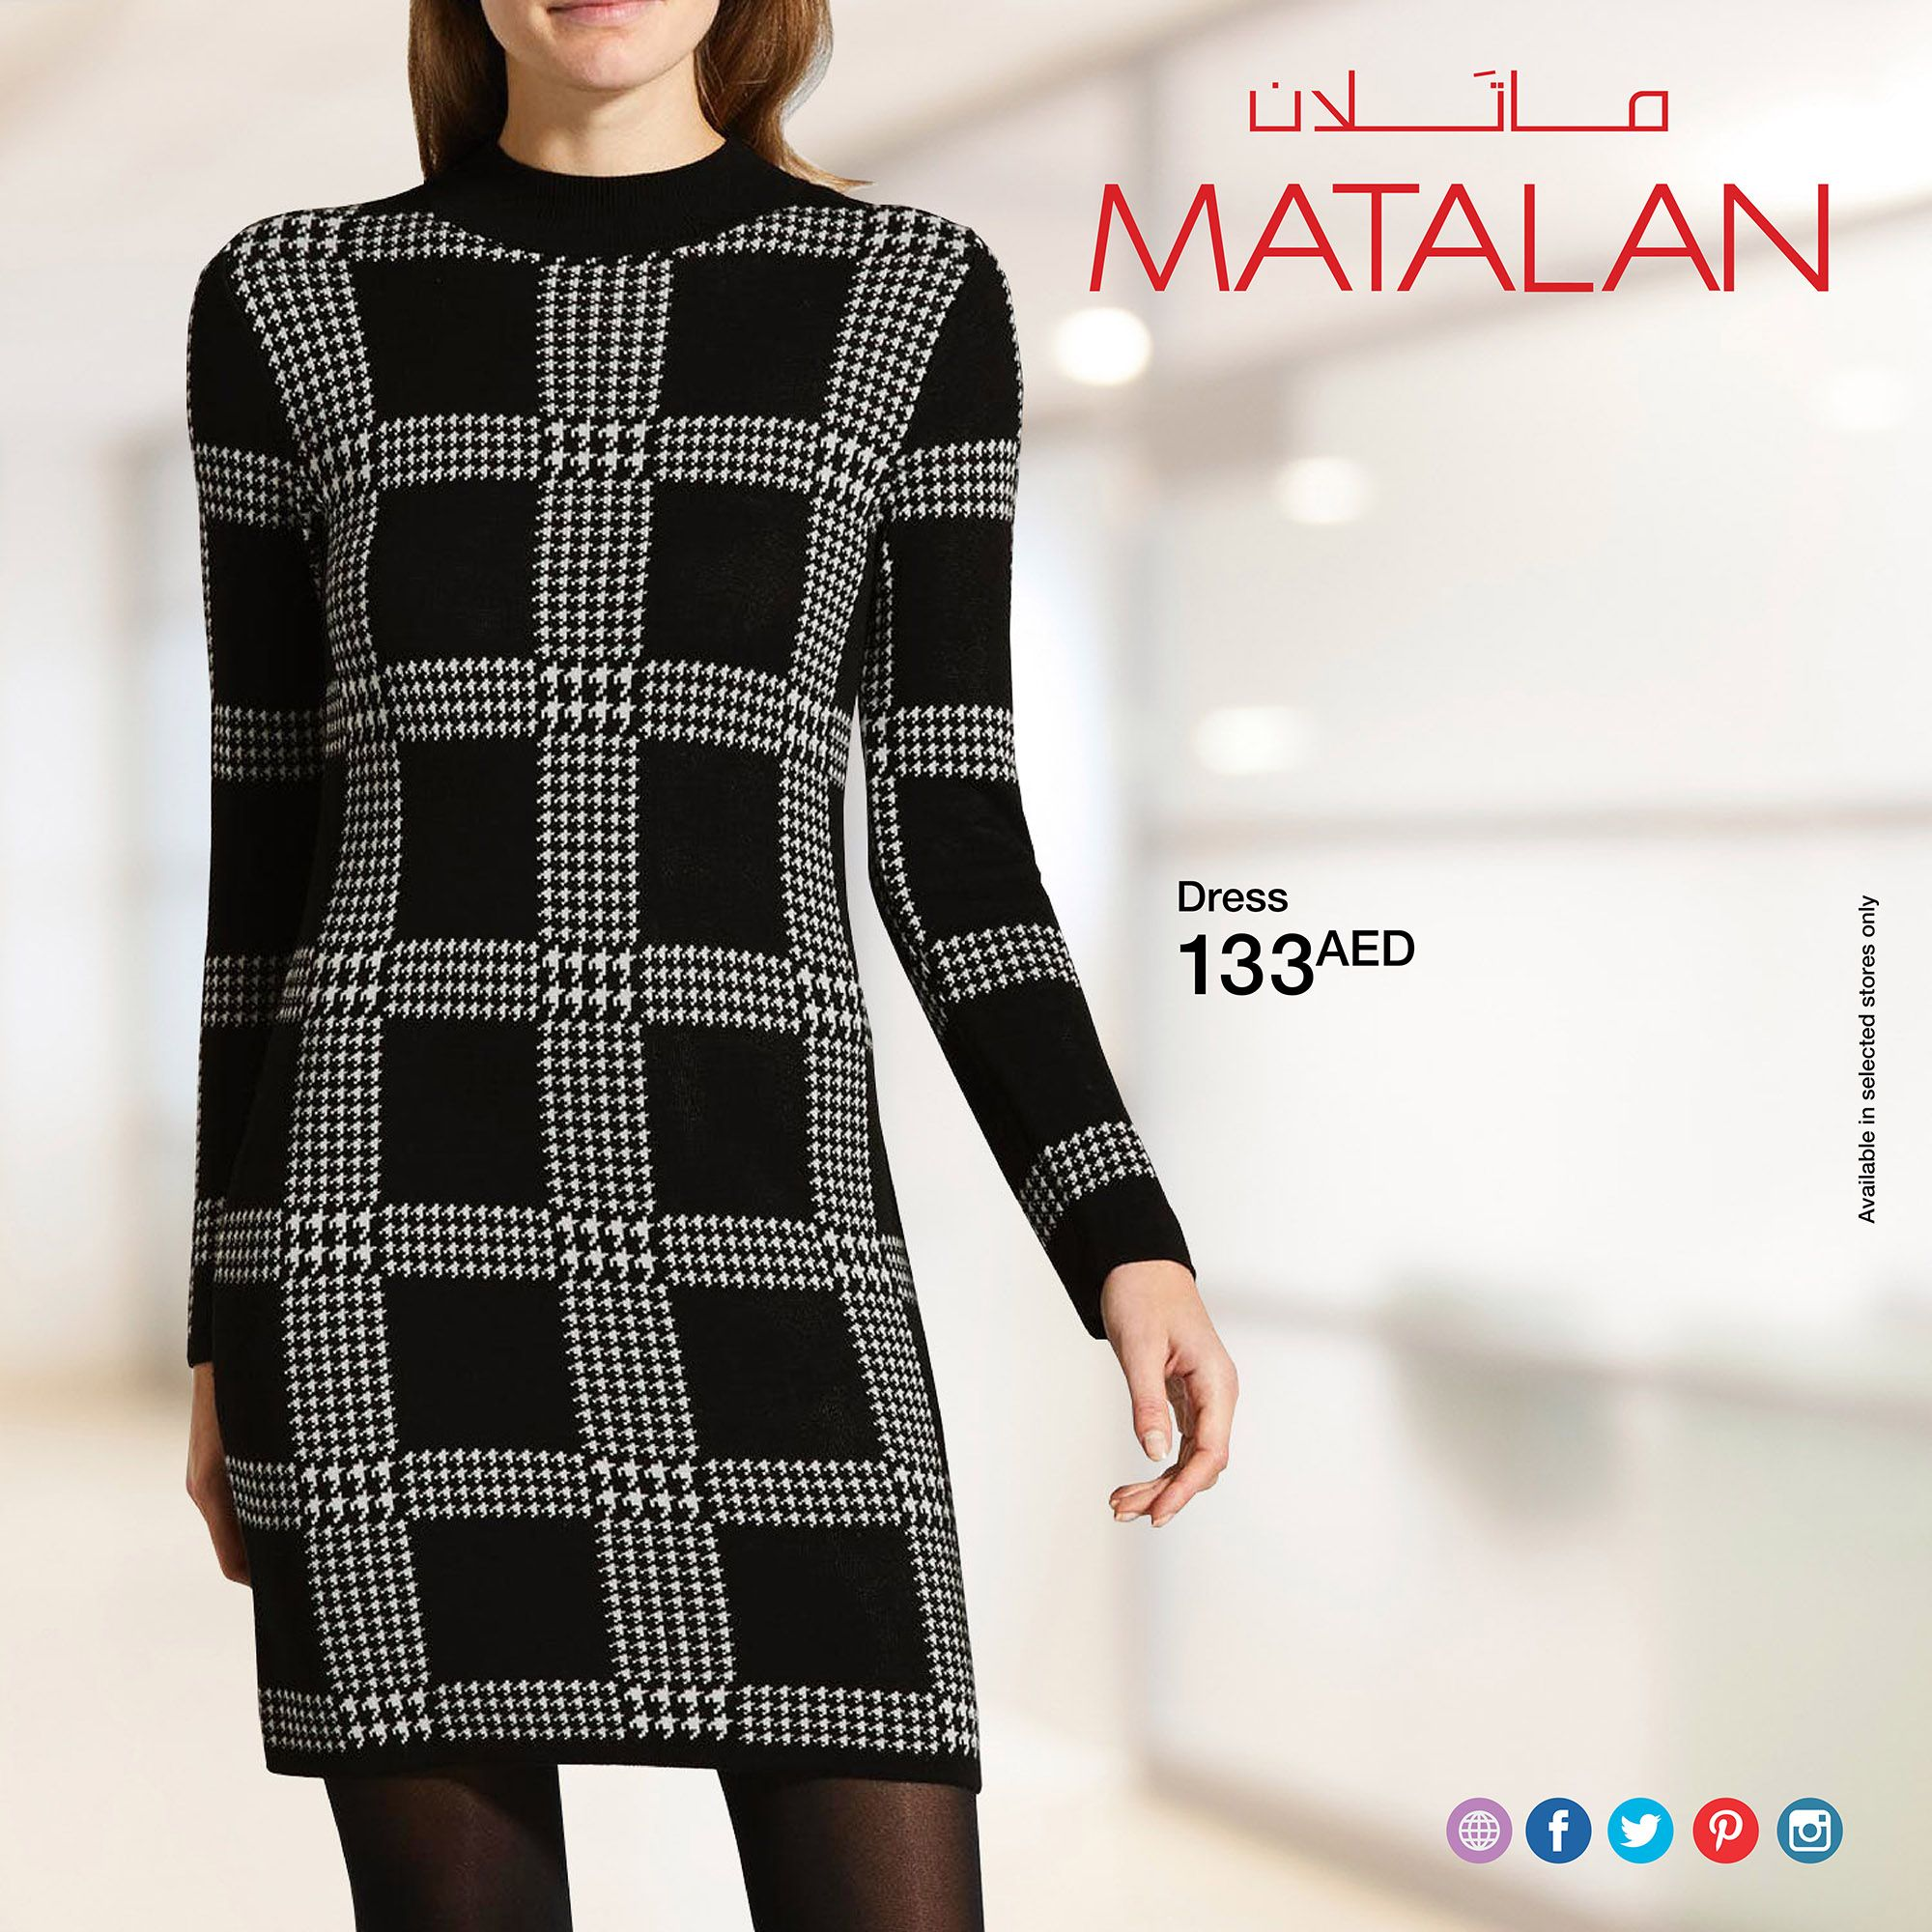 ff9ede07c6e Matalan Sale Ladies Dresses